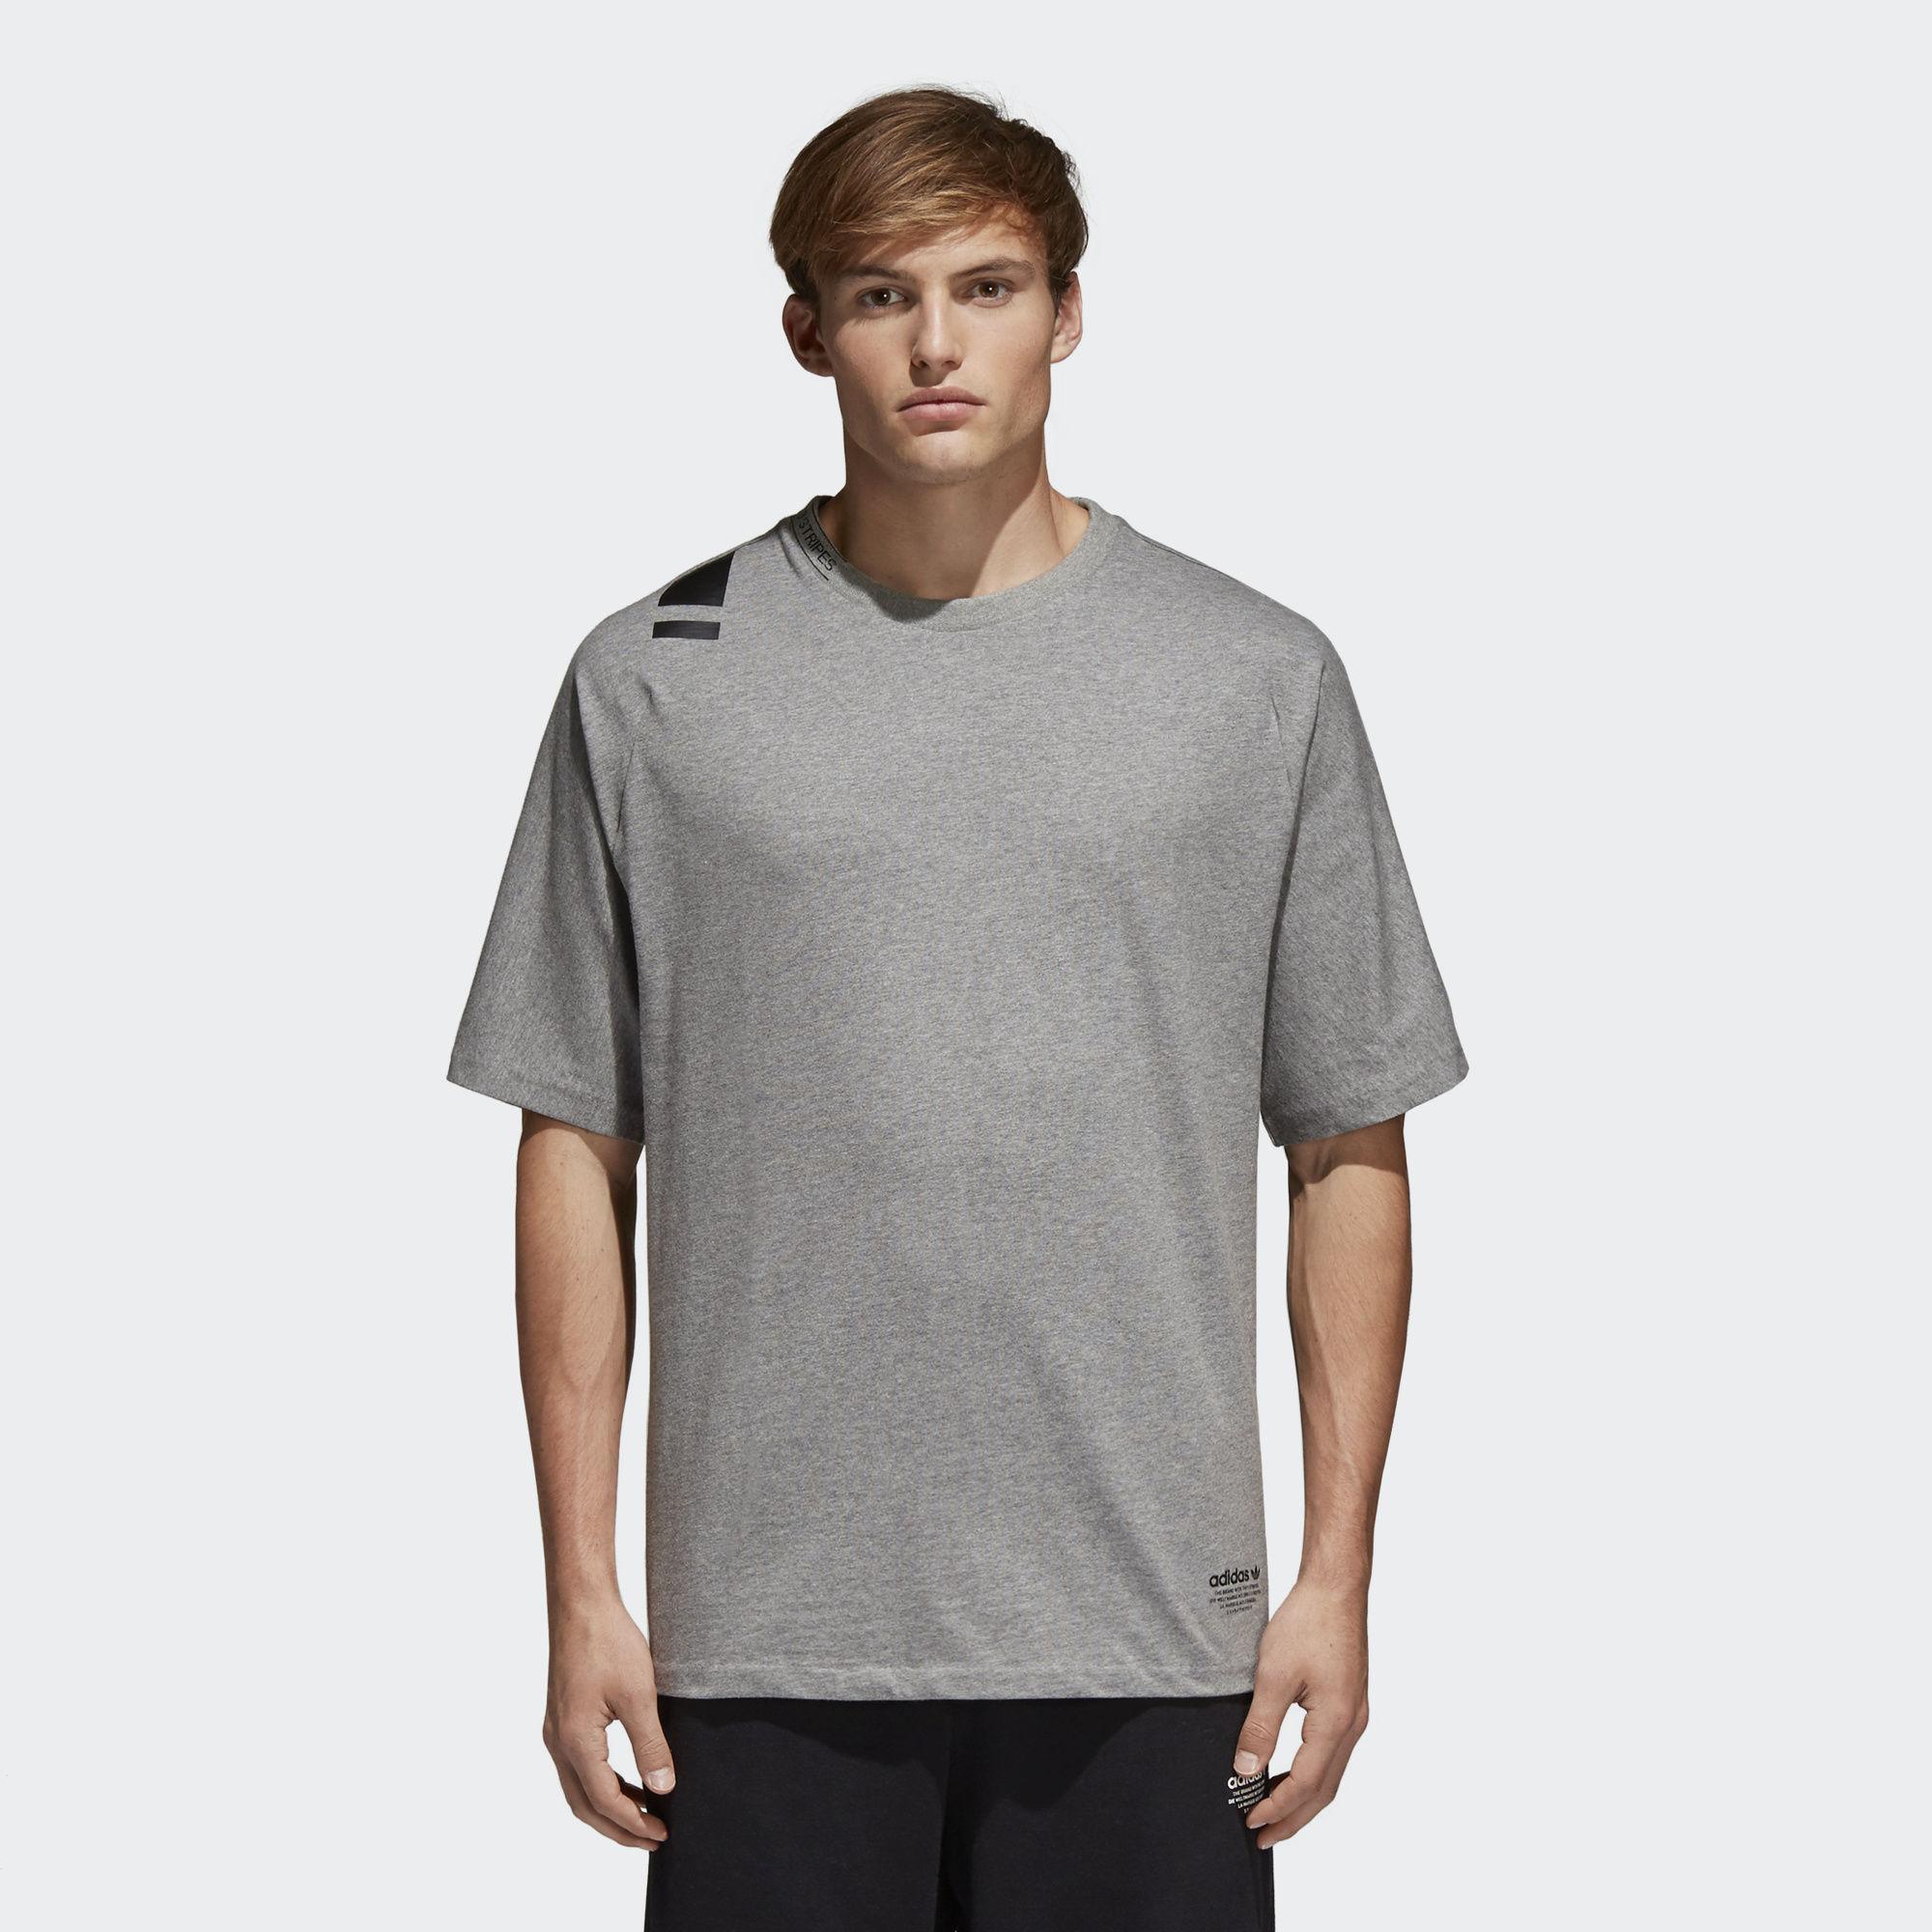 6ea4d022 Adidas - Gray Nmd Tee for Men - Lyst. View fullscreen